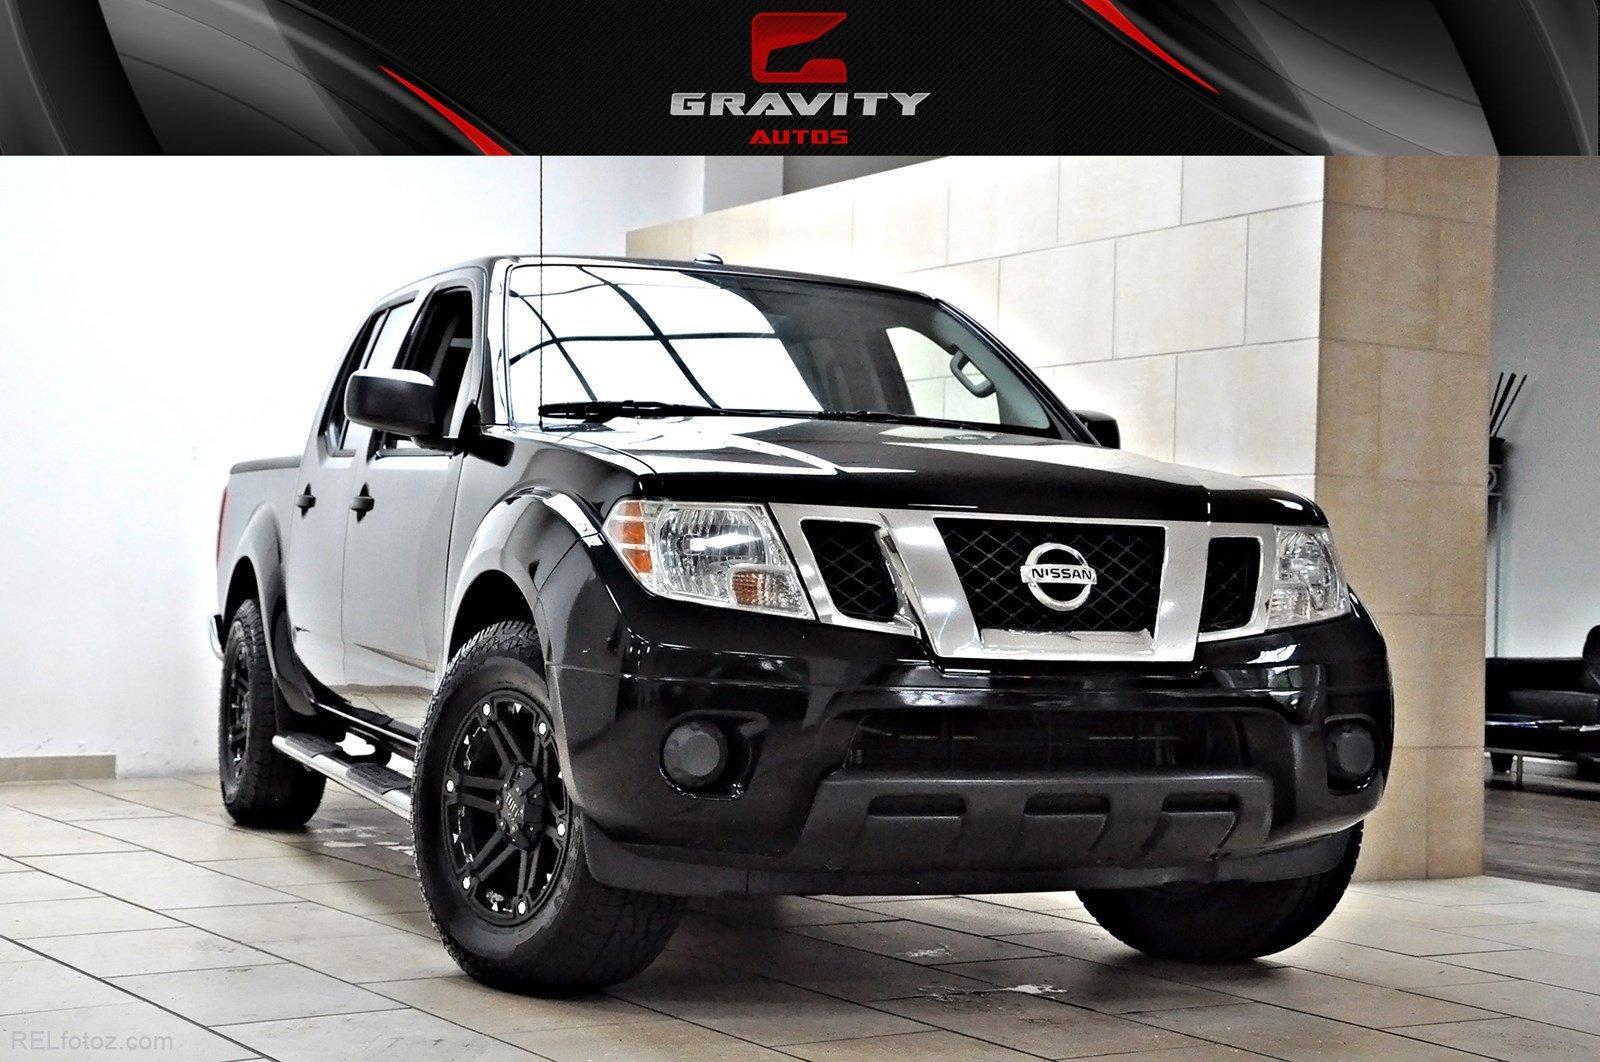 2014 Nissan Frontier Sv Stock 721621 For Sale Near Sandy